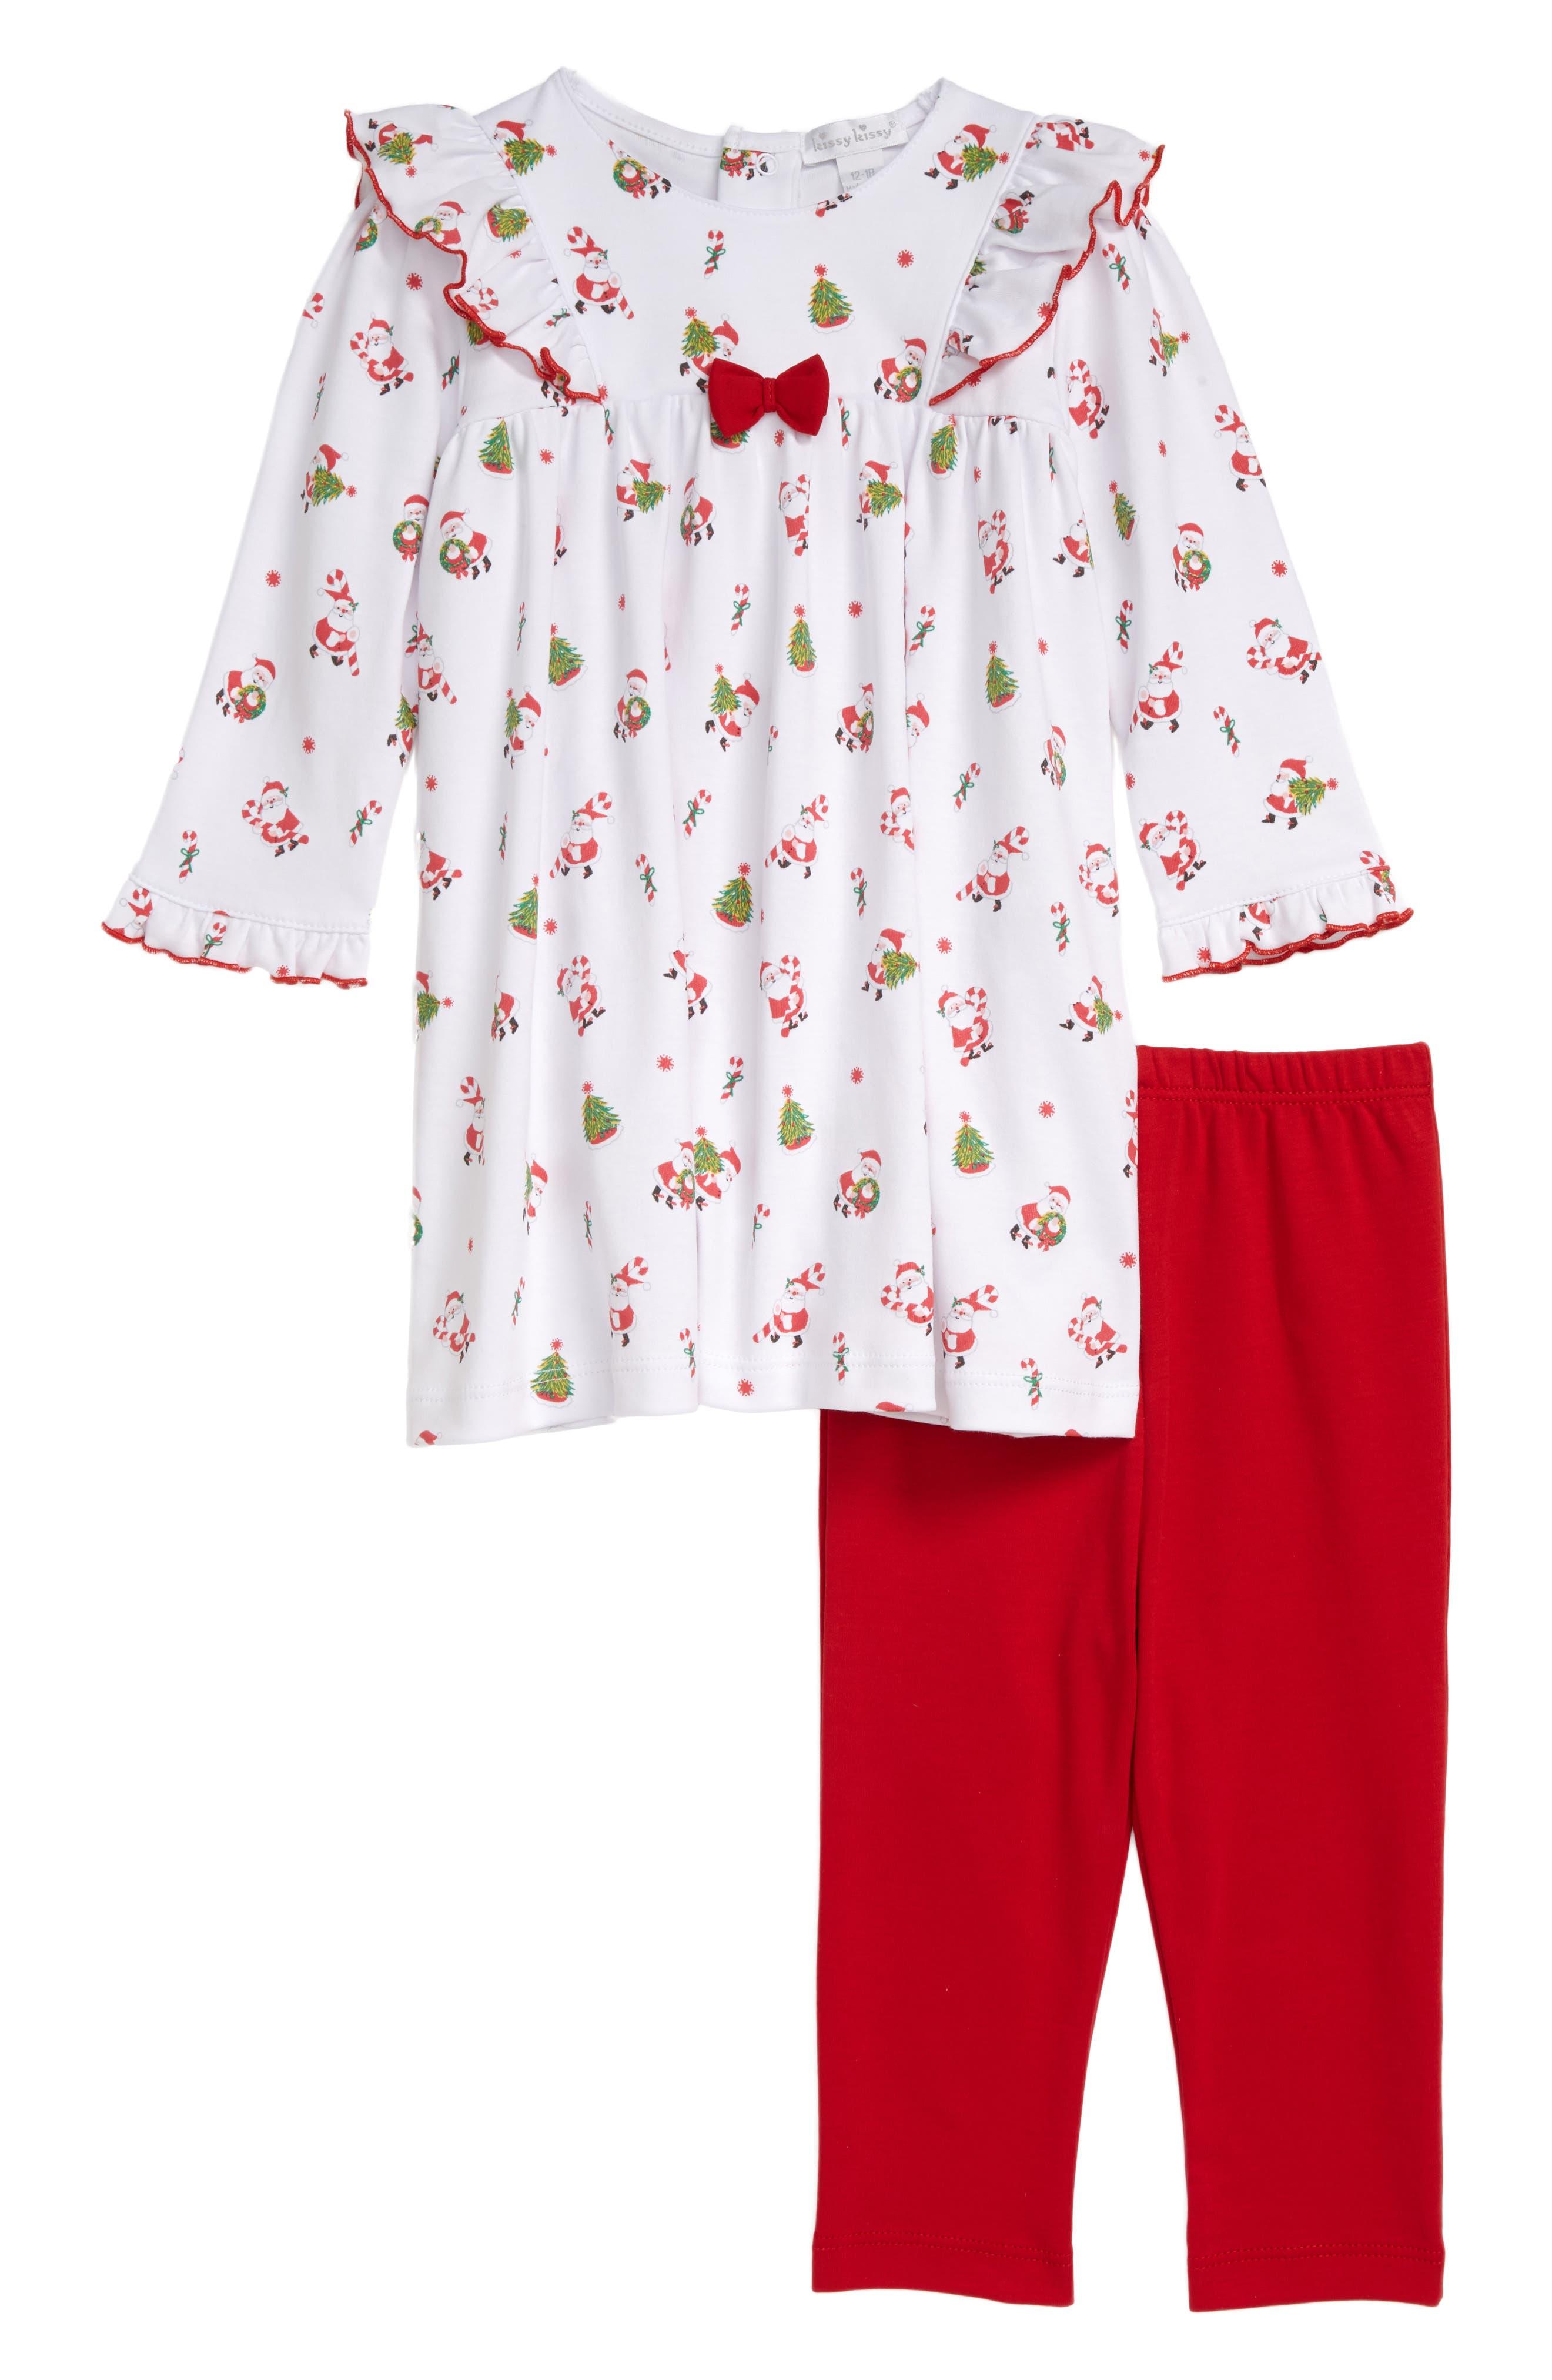 Image of Kissy Kissy Santa Print Dress & Leggings Set